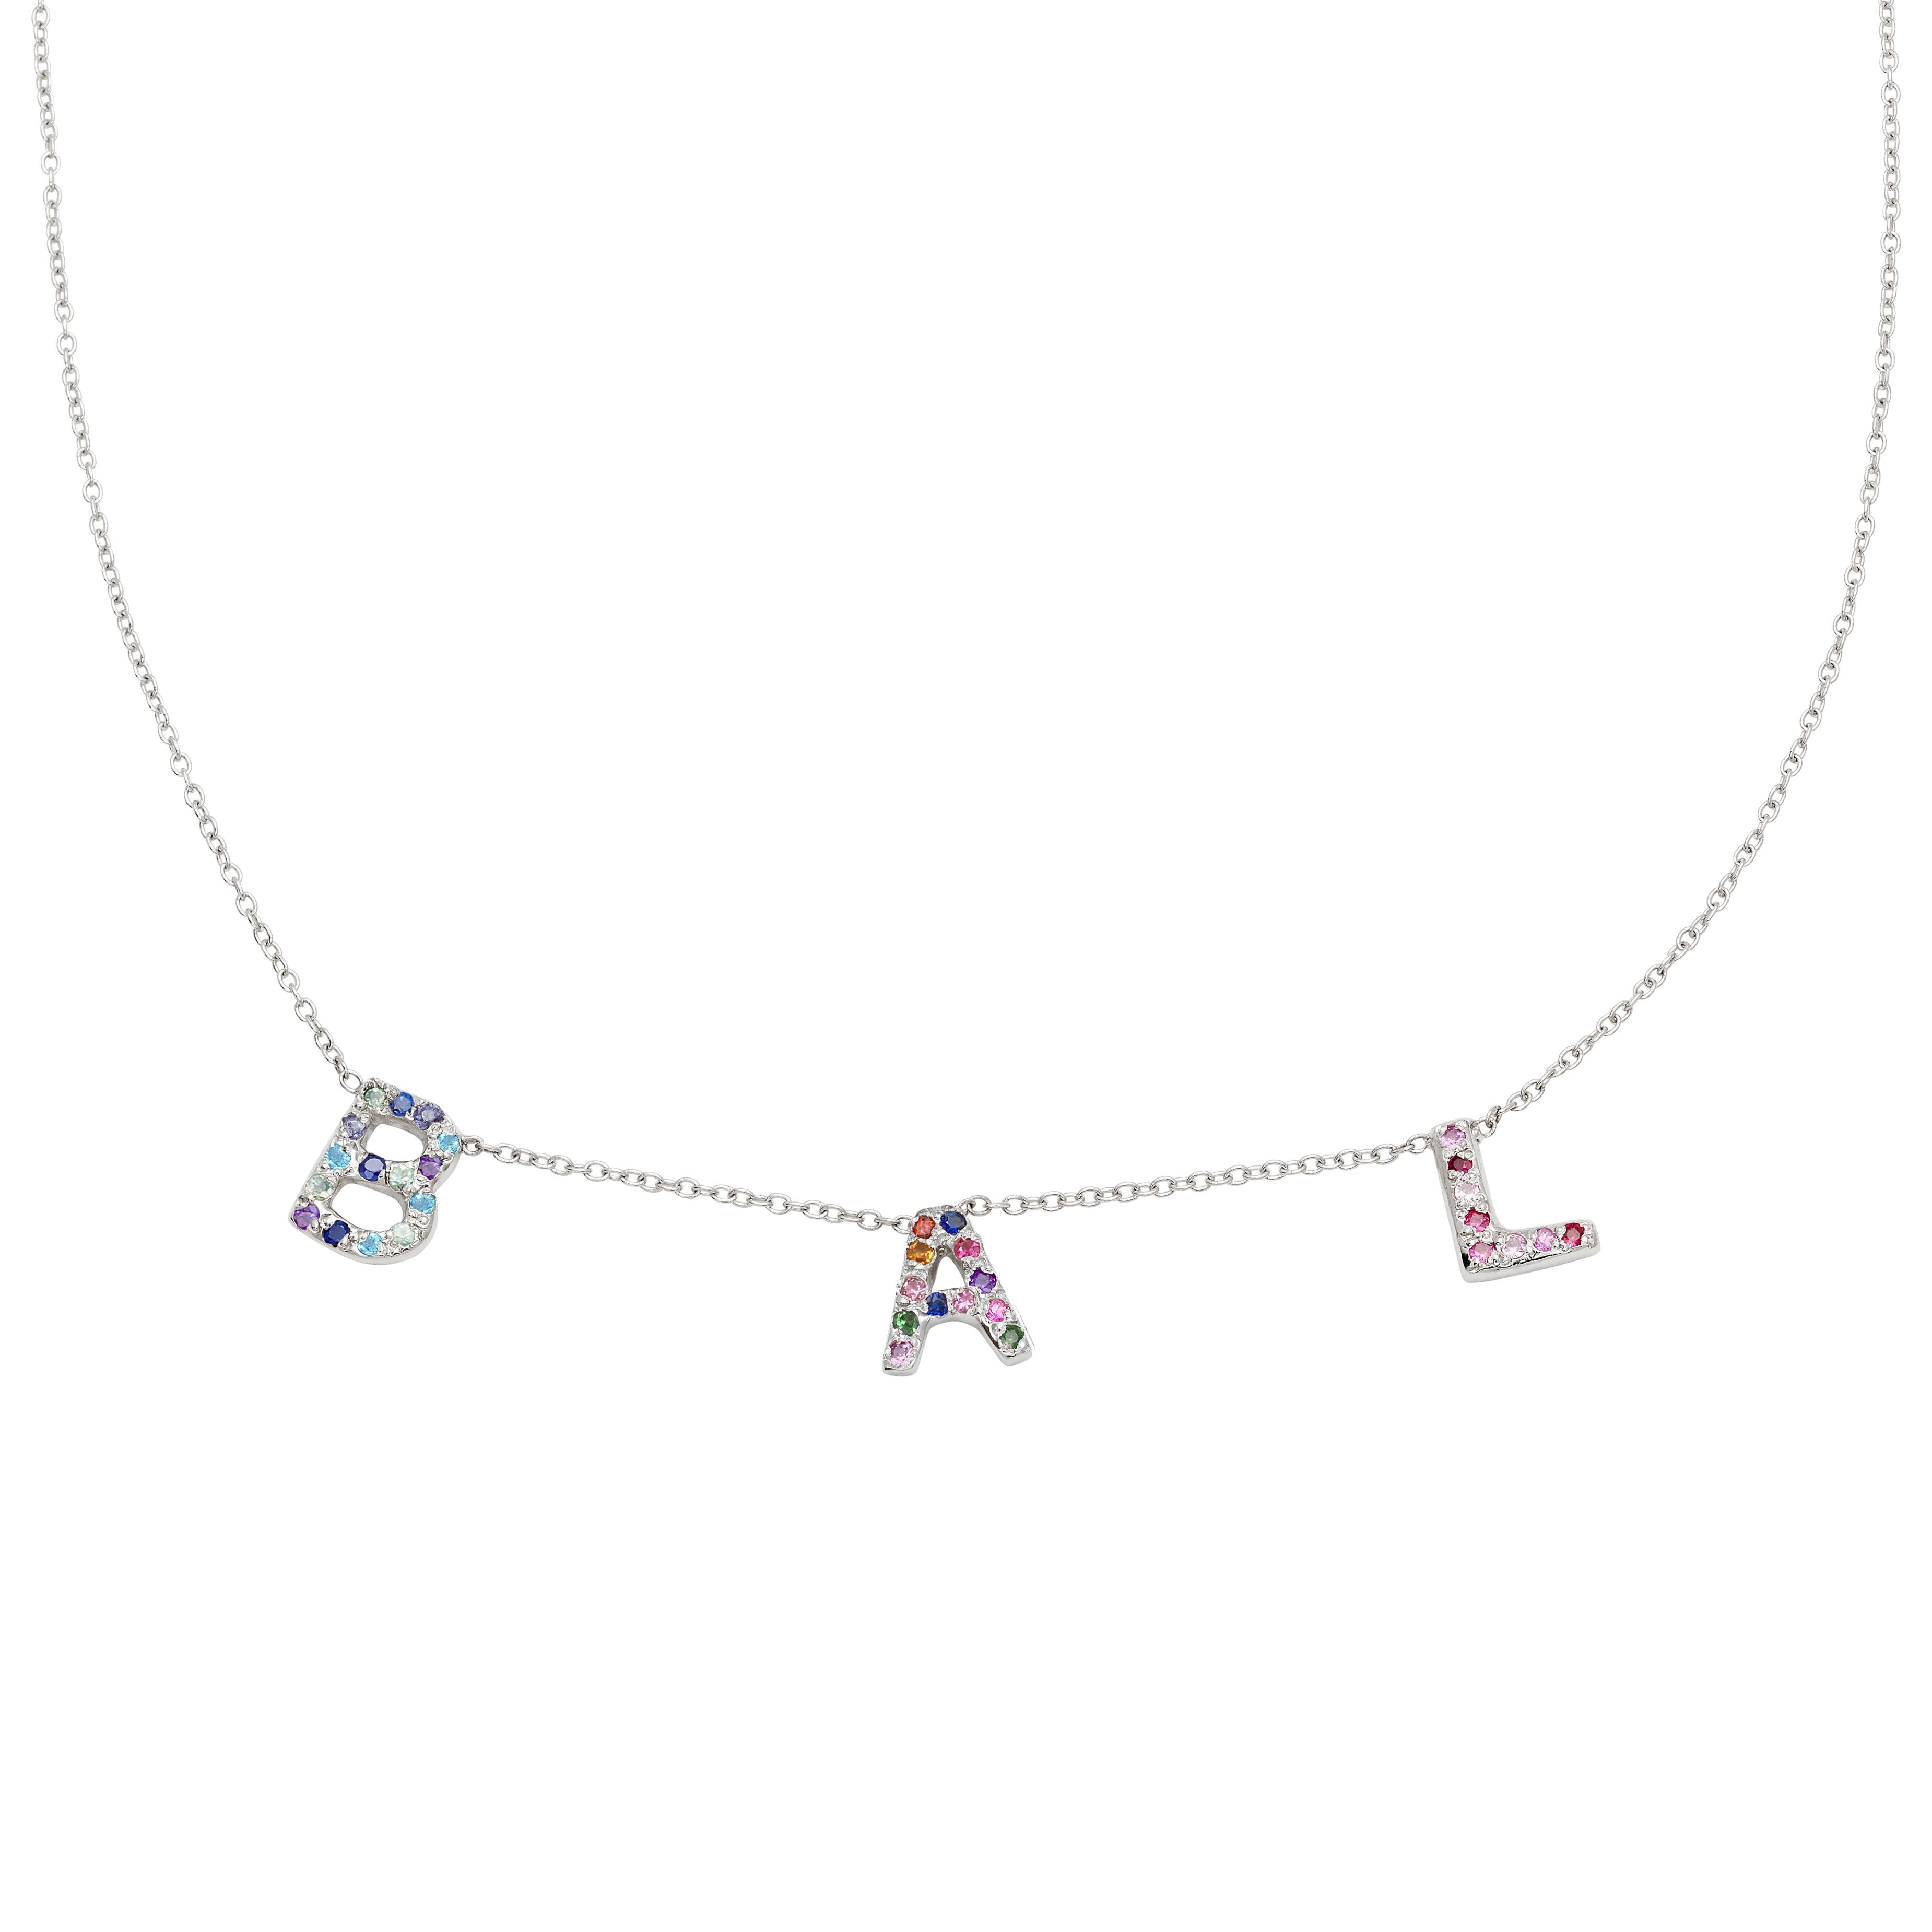 3 Letter Necklace in Platinum